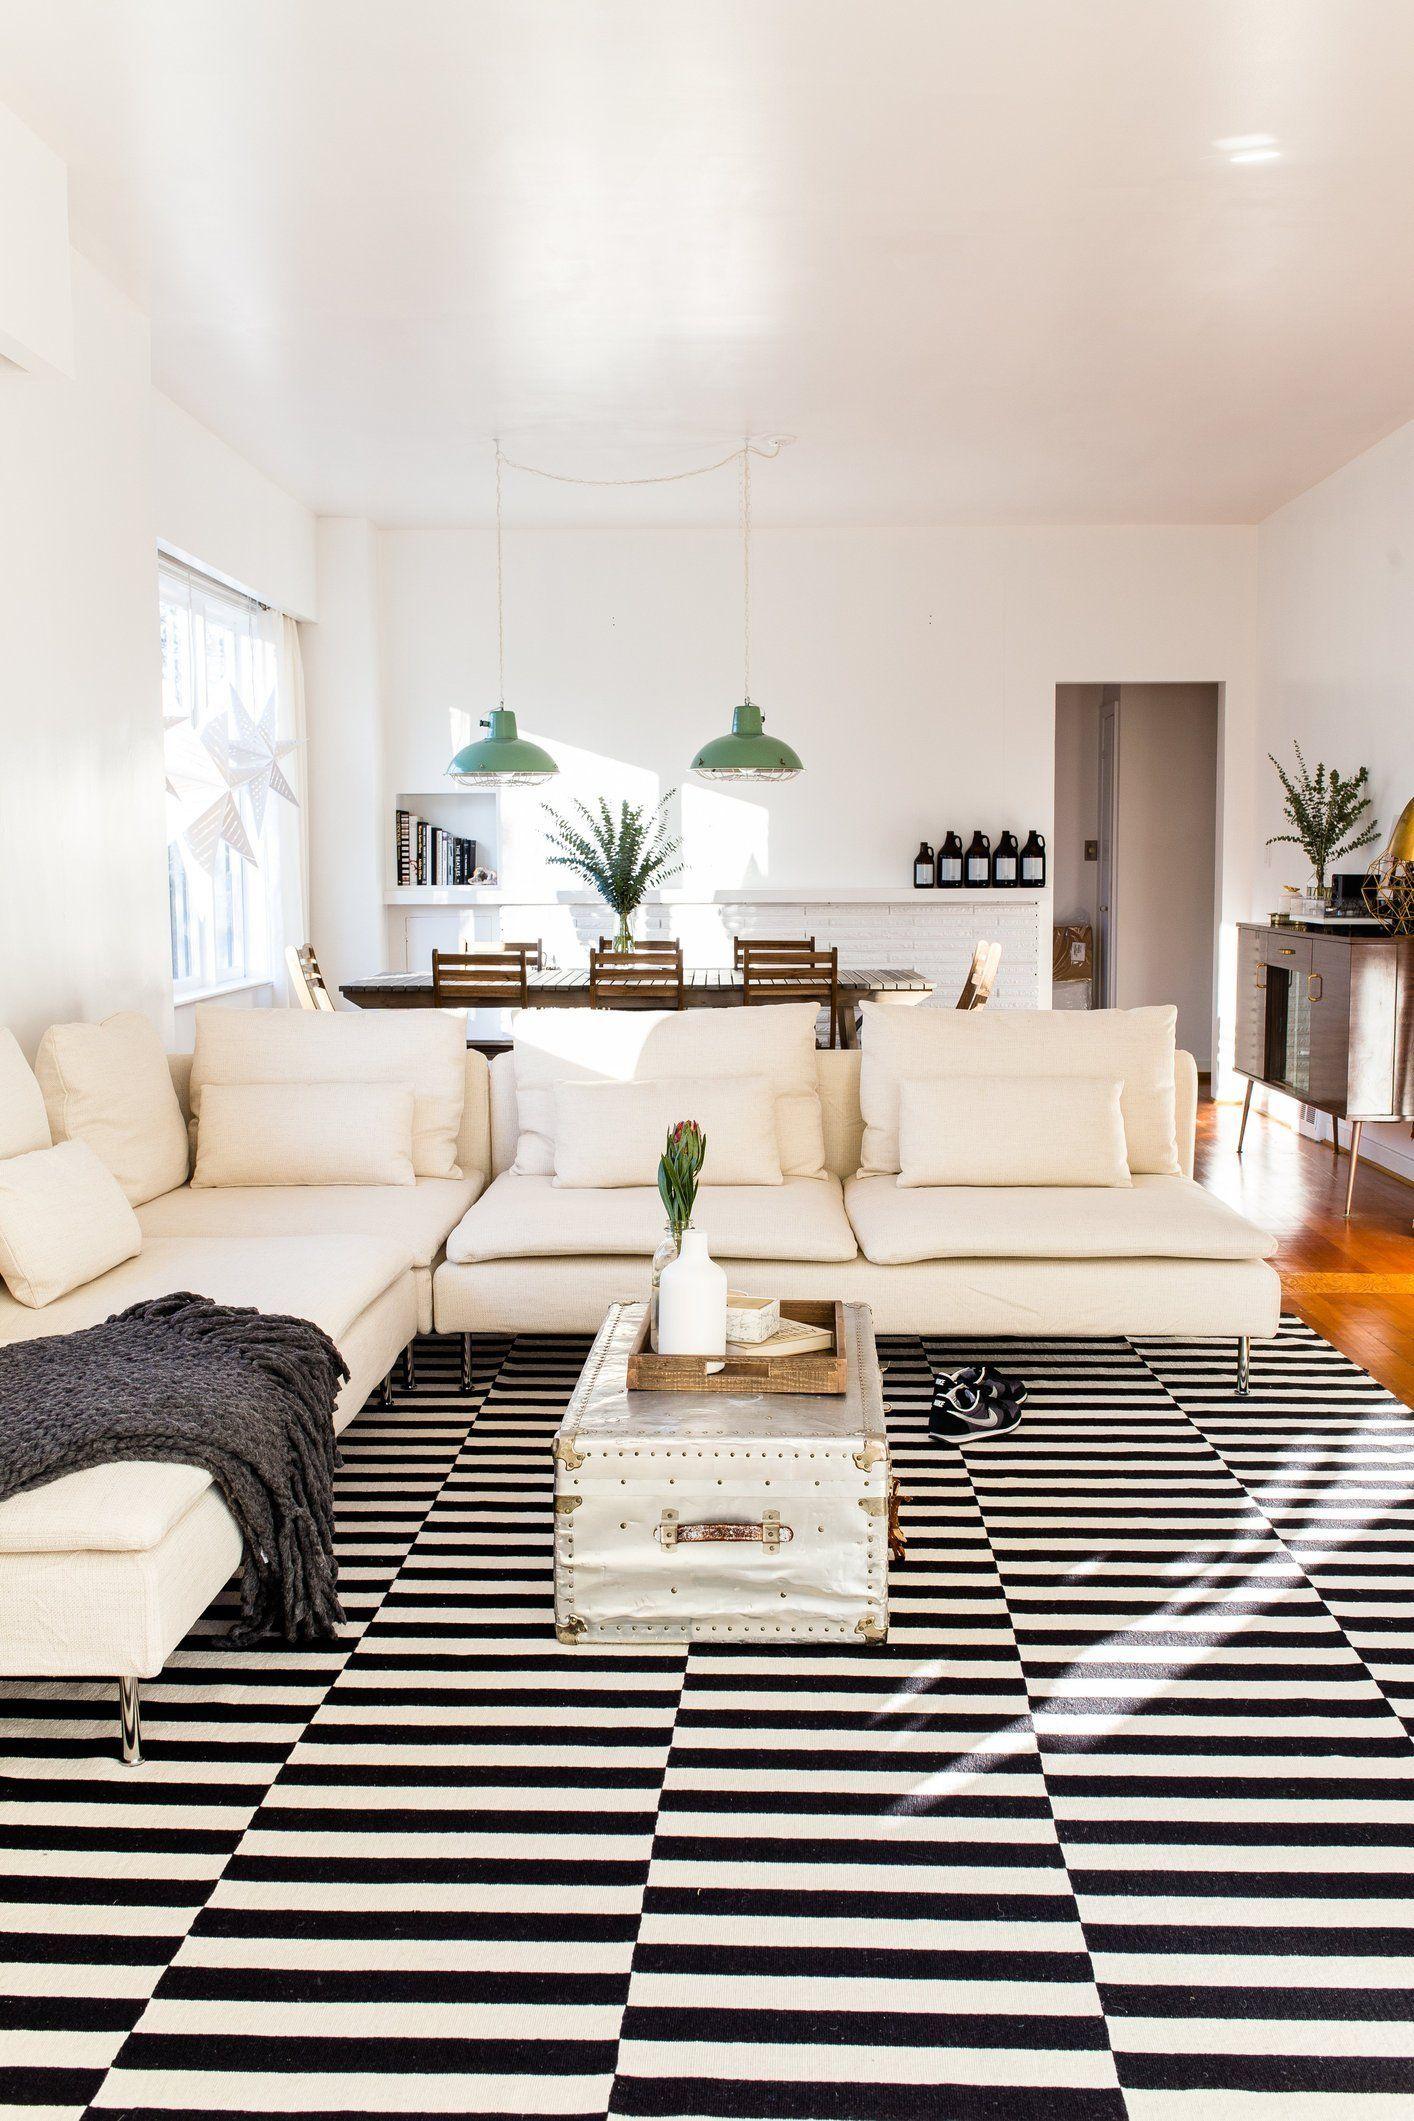 Living Room Design Ikea: The Most Design-Forward Sofa At IKEA (We've Been Spotting